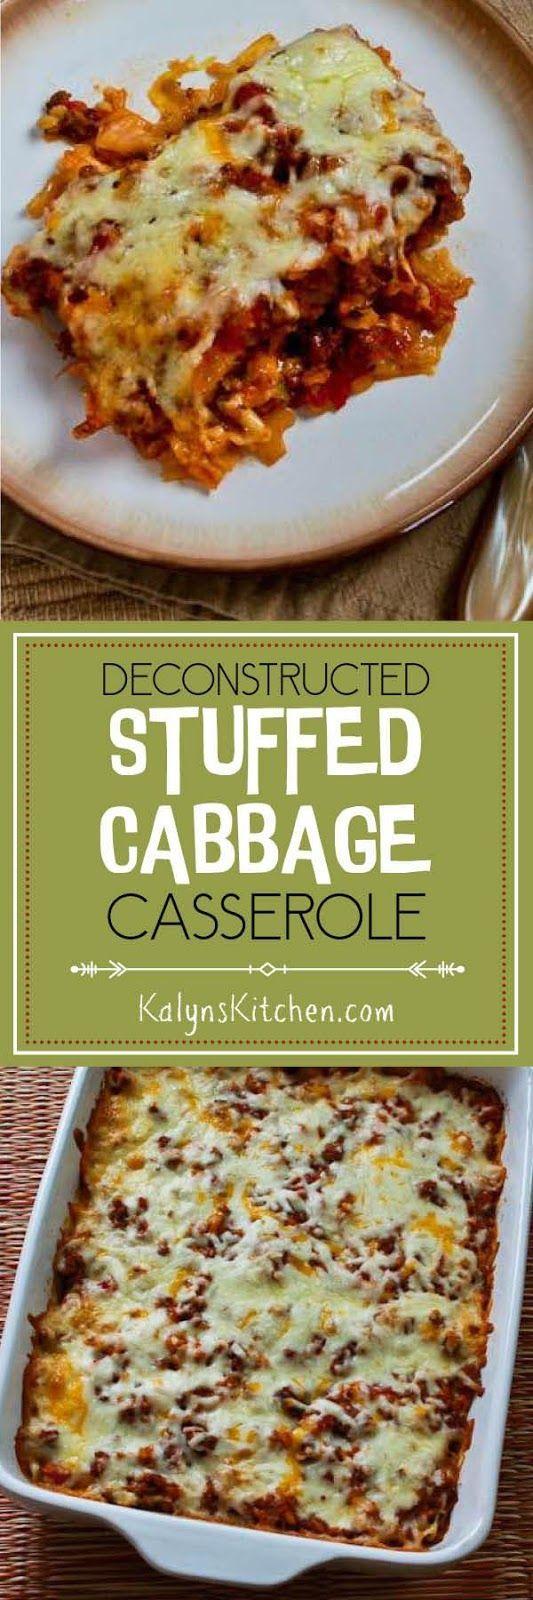 Deconstructed Stuffed Cabbage Casserole | Stuffed Cabbage Casserole ...